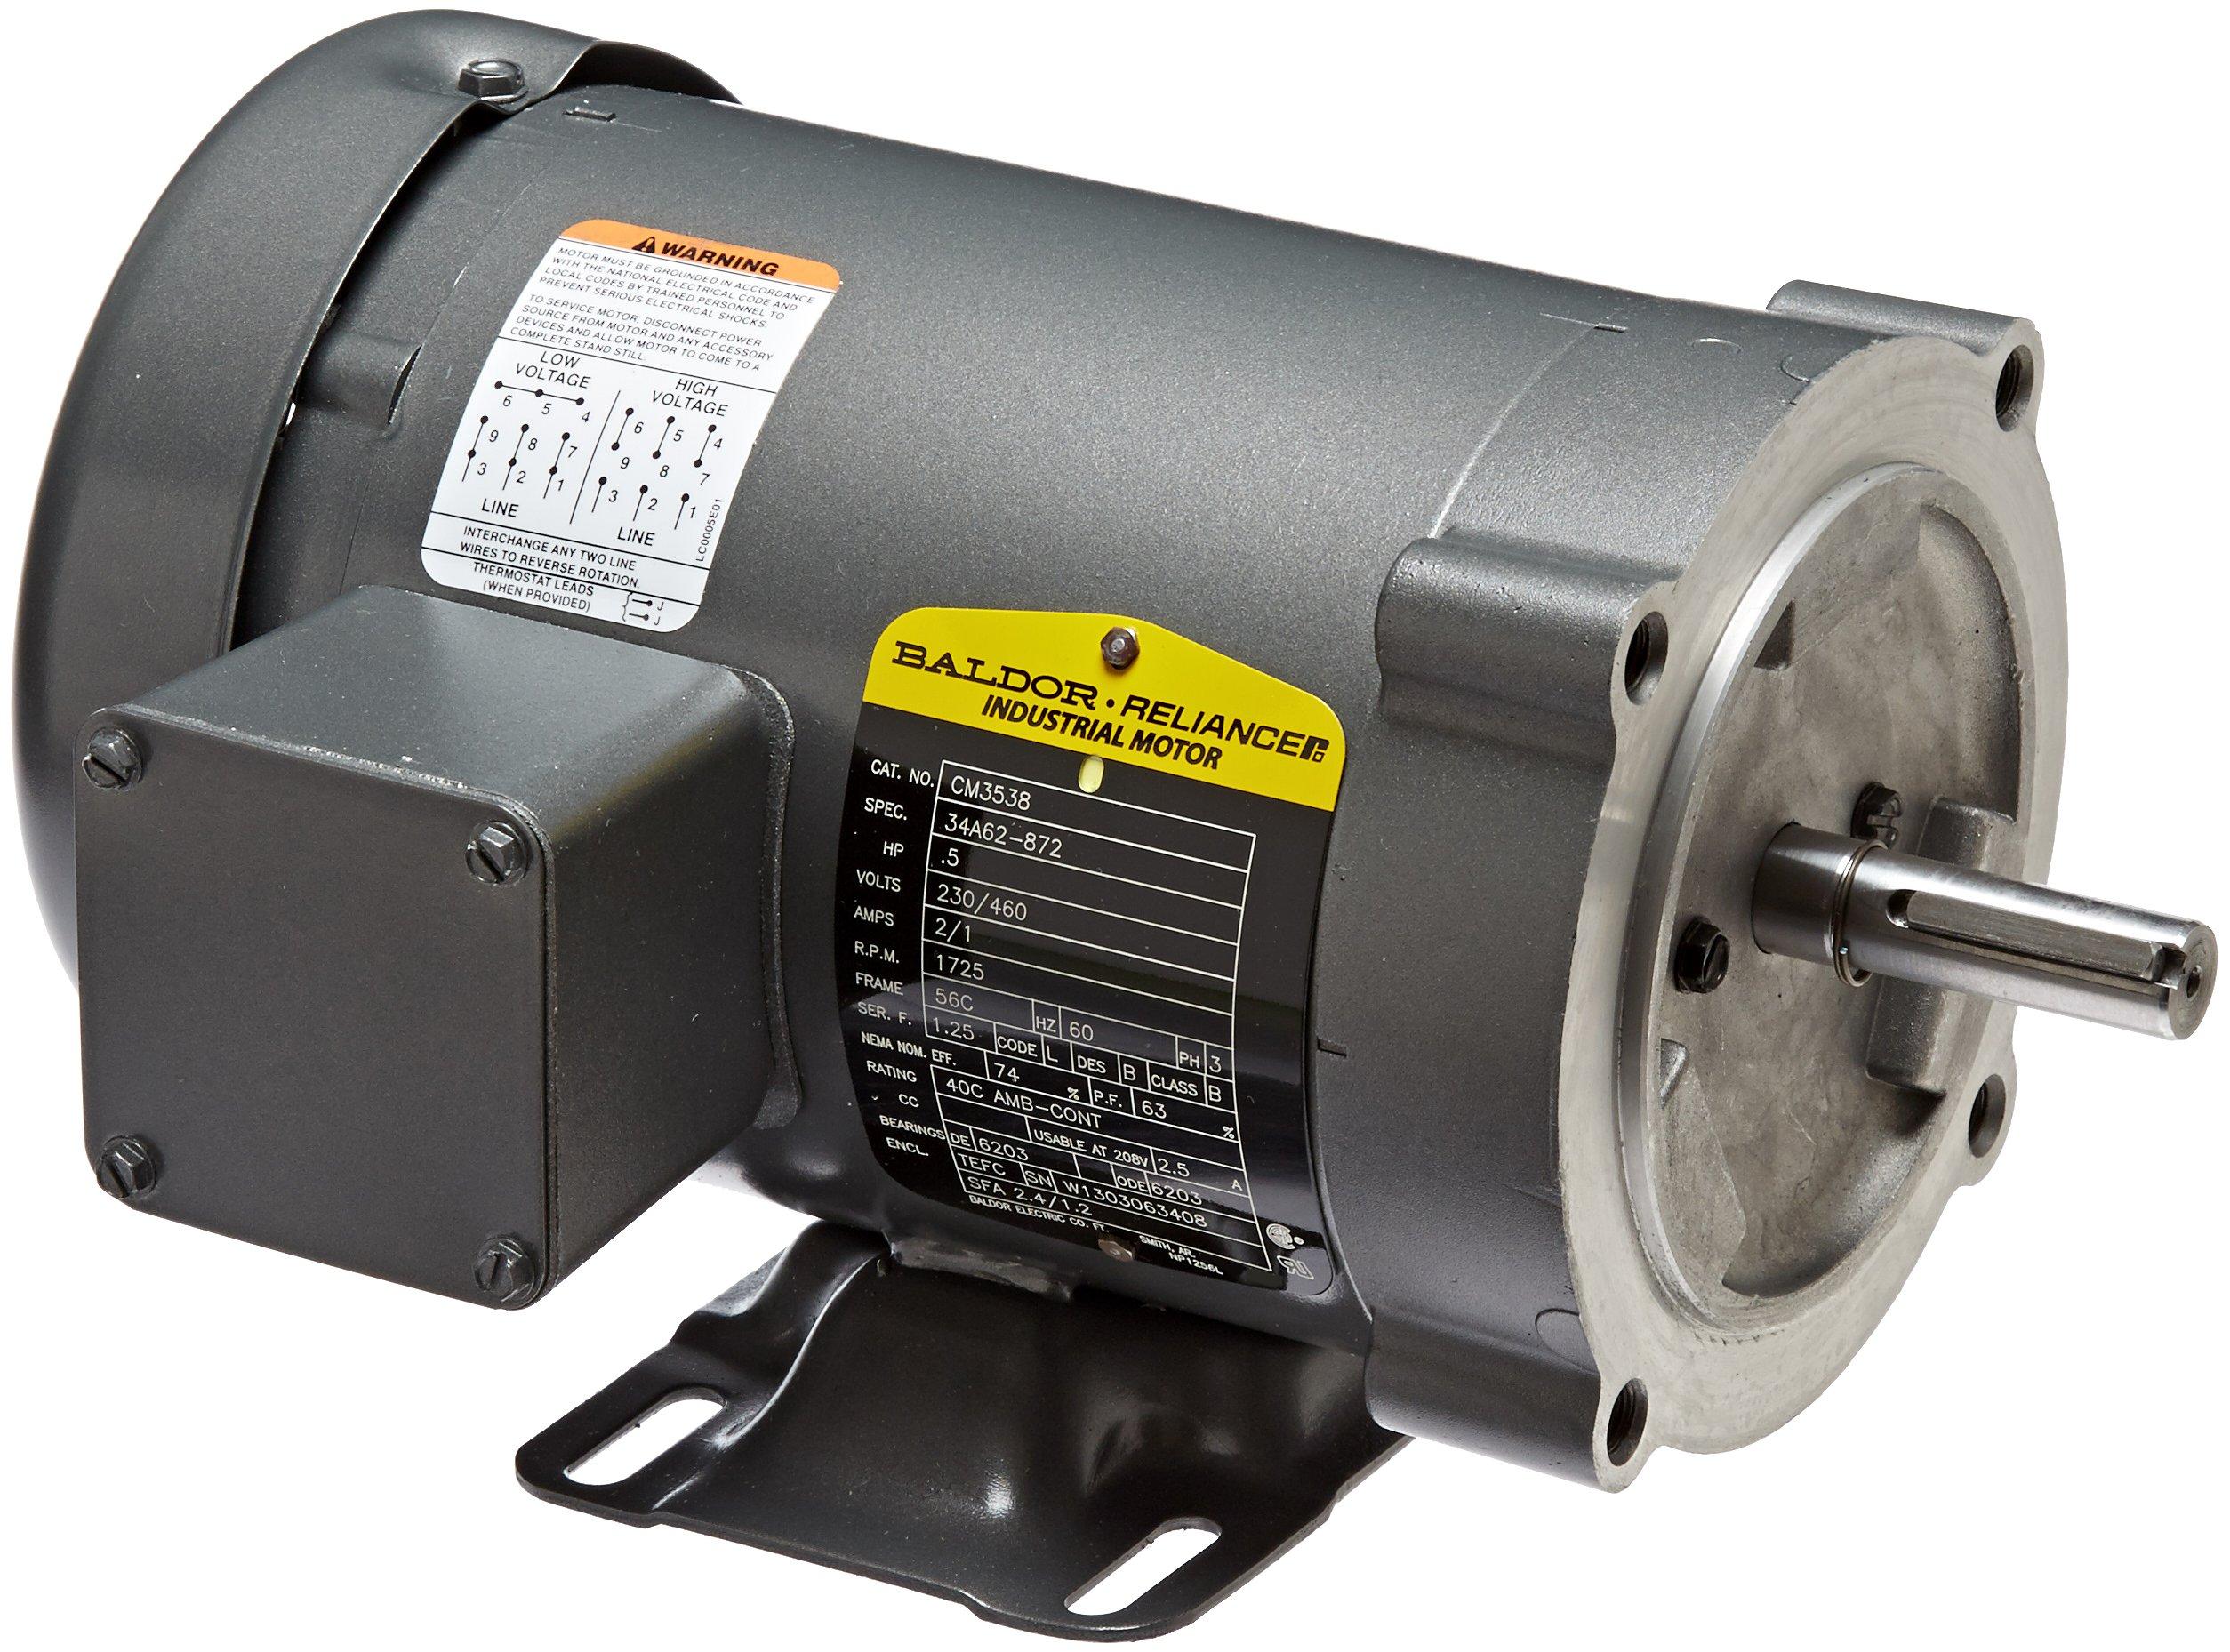 Baldor CM3538 General Purpose AC Motor, 3 Phase, 56C Frame, TEFC Enclosure, 1/2Hp Output, 1725rpm, 60Hz, 230/460V Voltage by Baldor